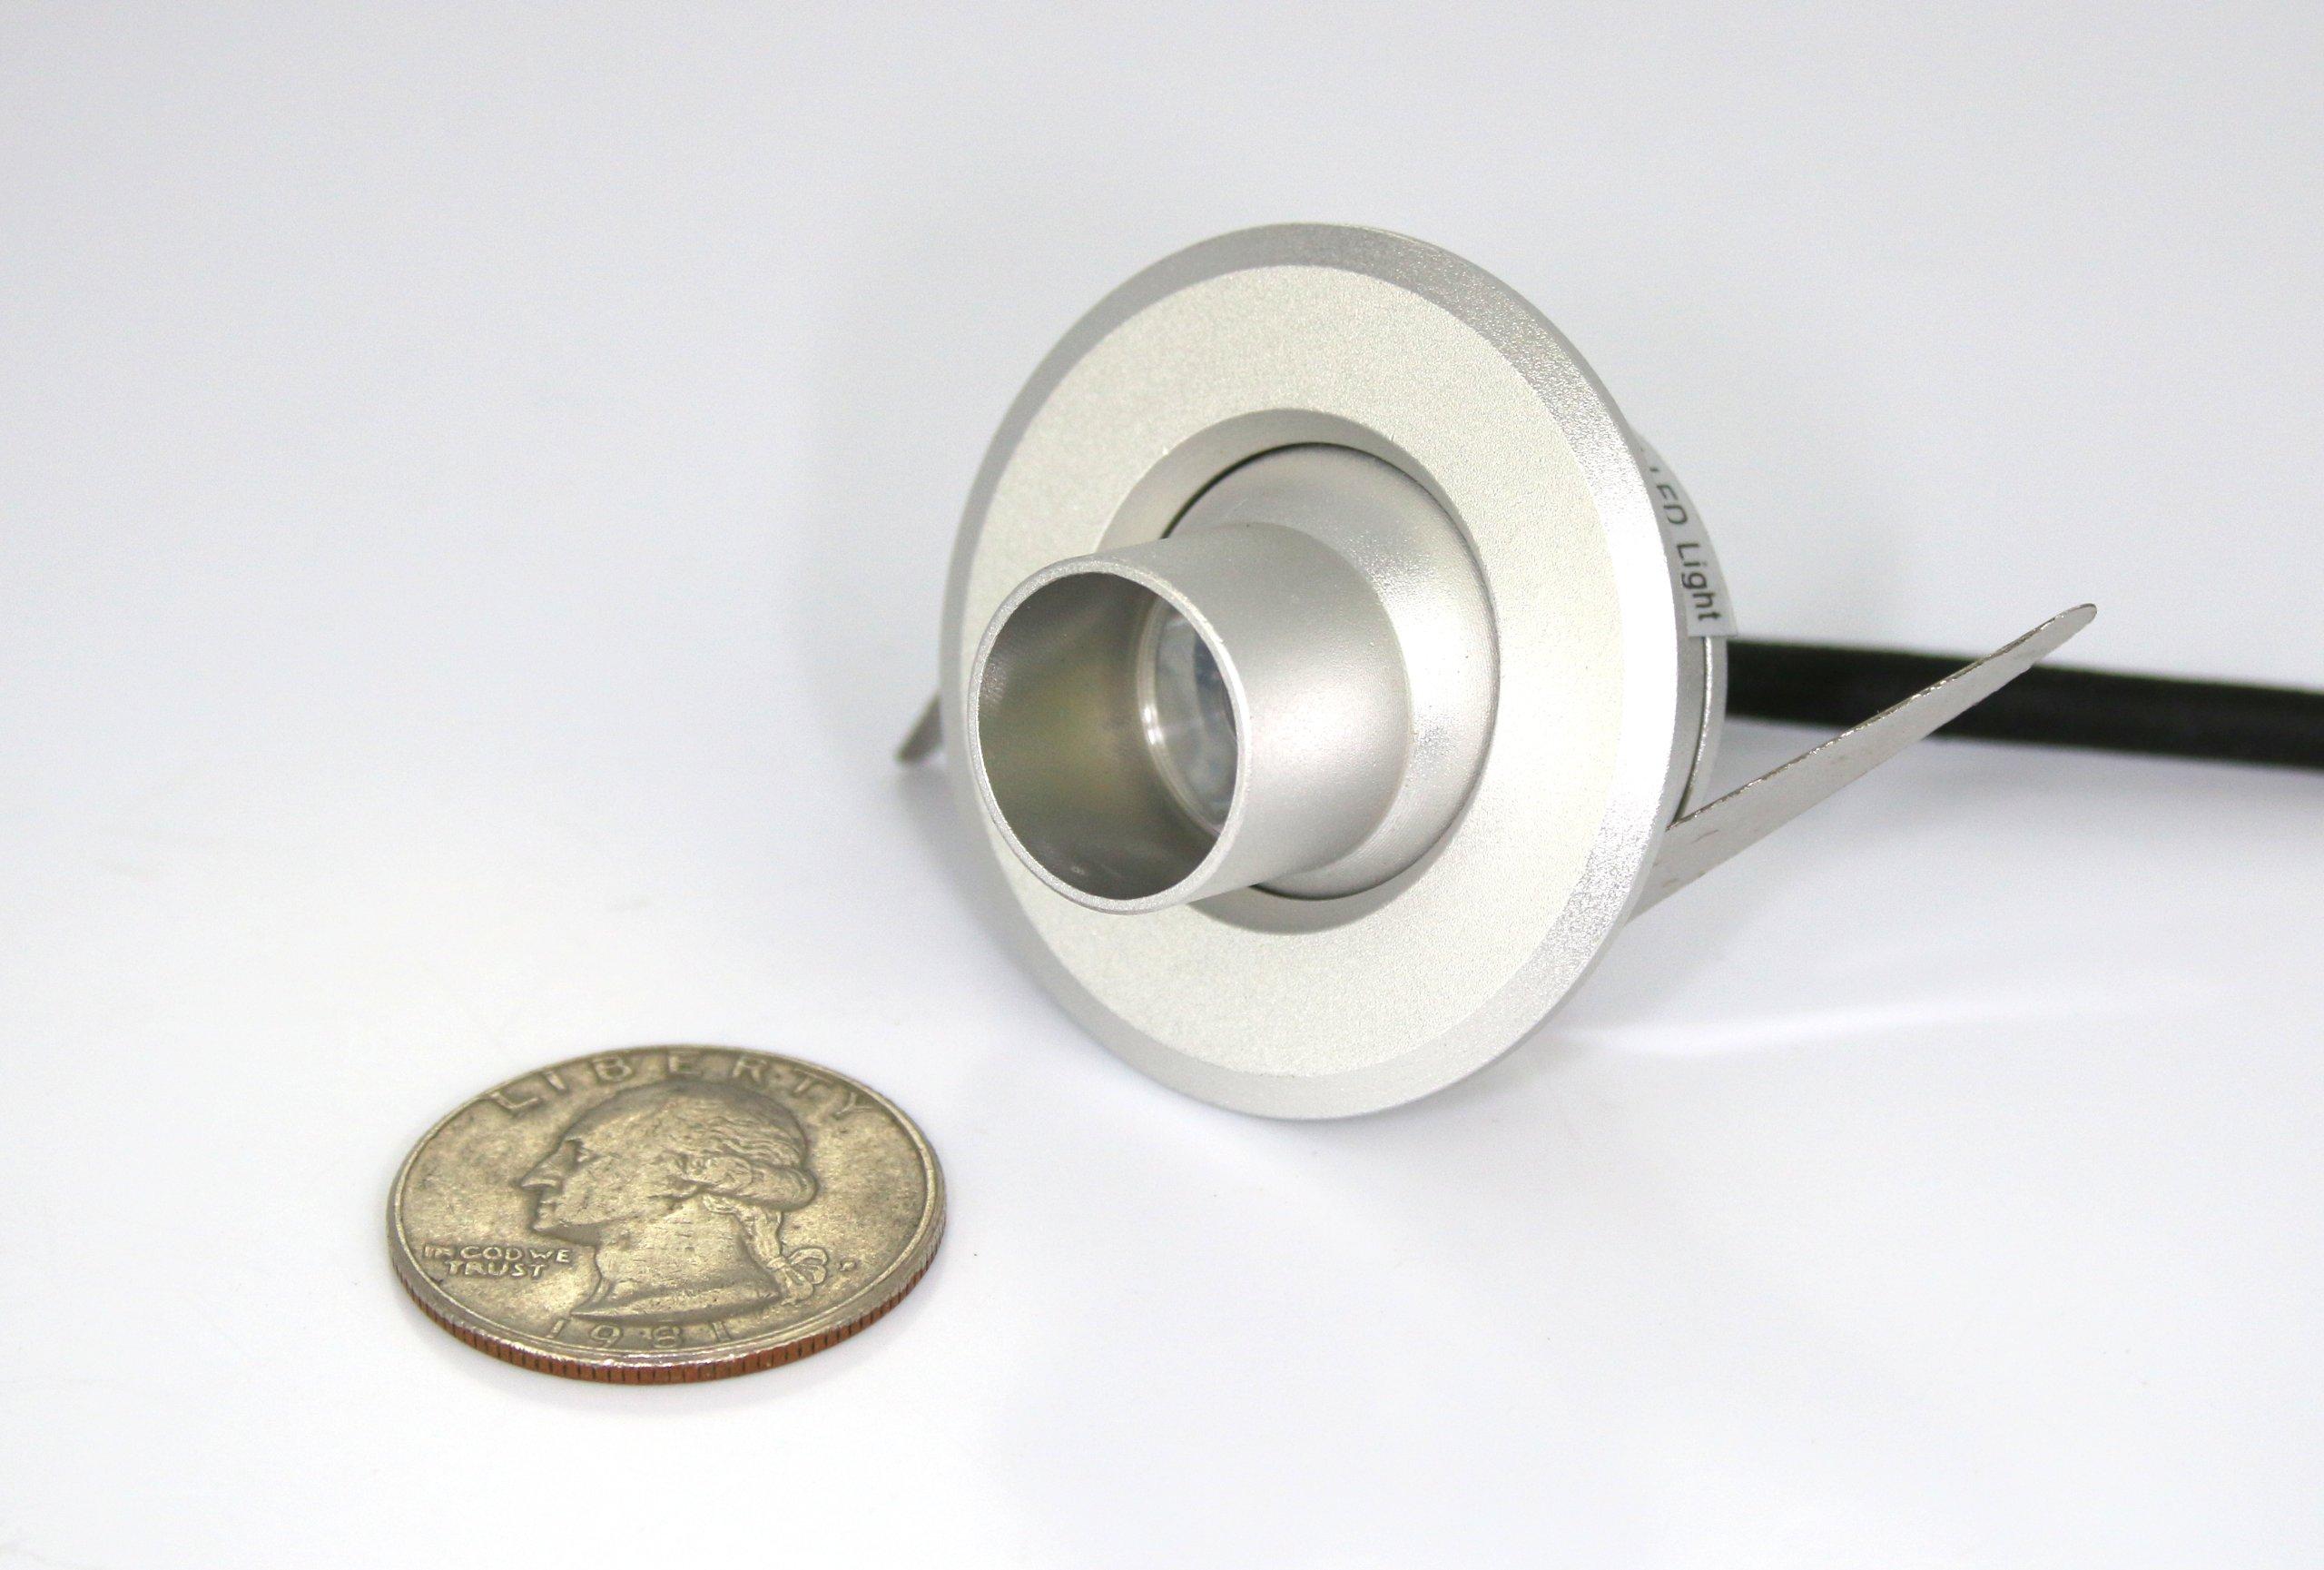 Mini EyeBall LED Fixture - Warm White LED Downlight for Cabinets, Displays, Spotlights - 90 to 220VAC